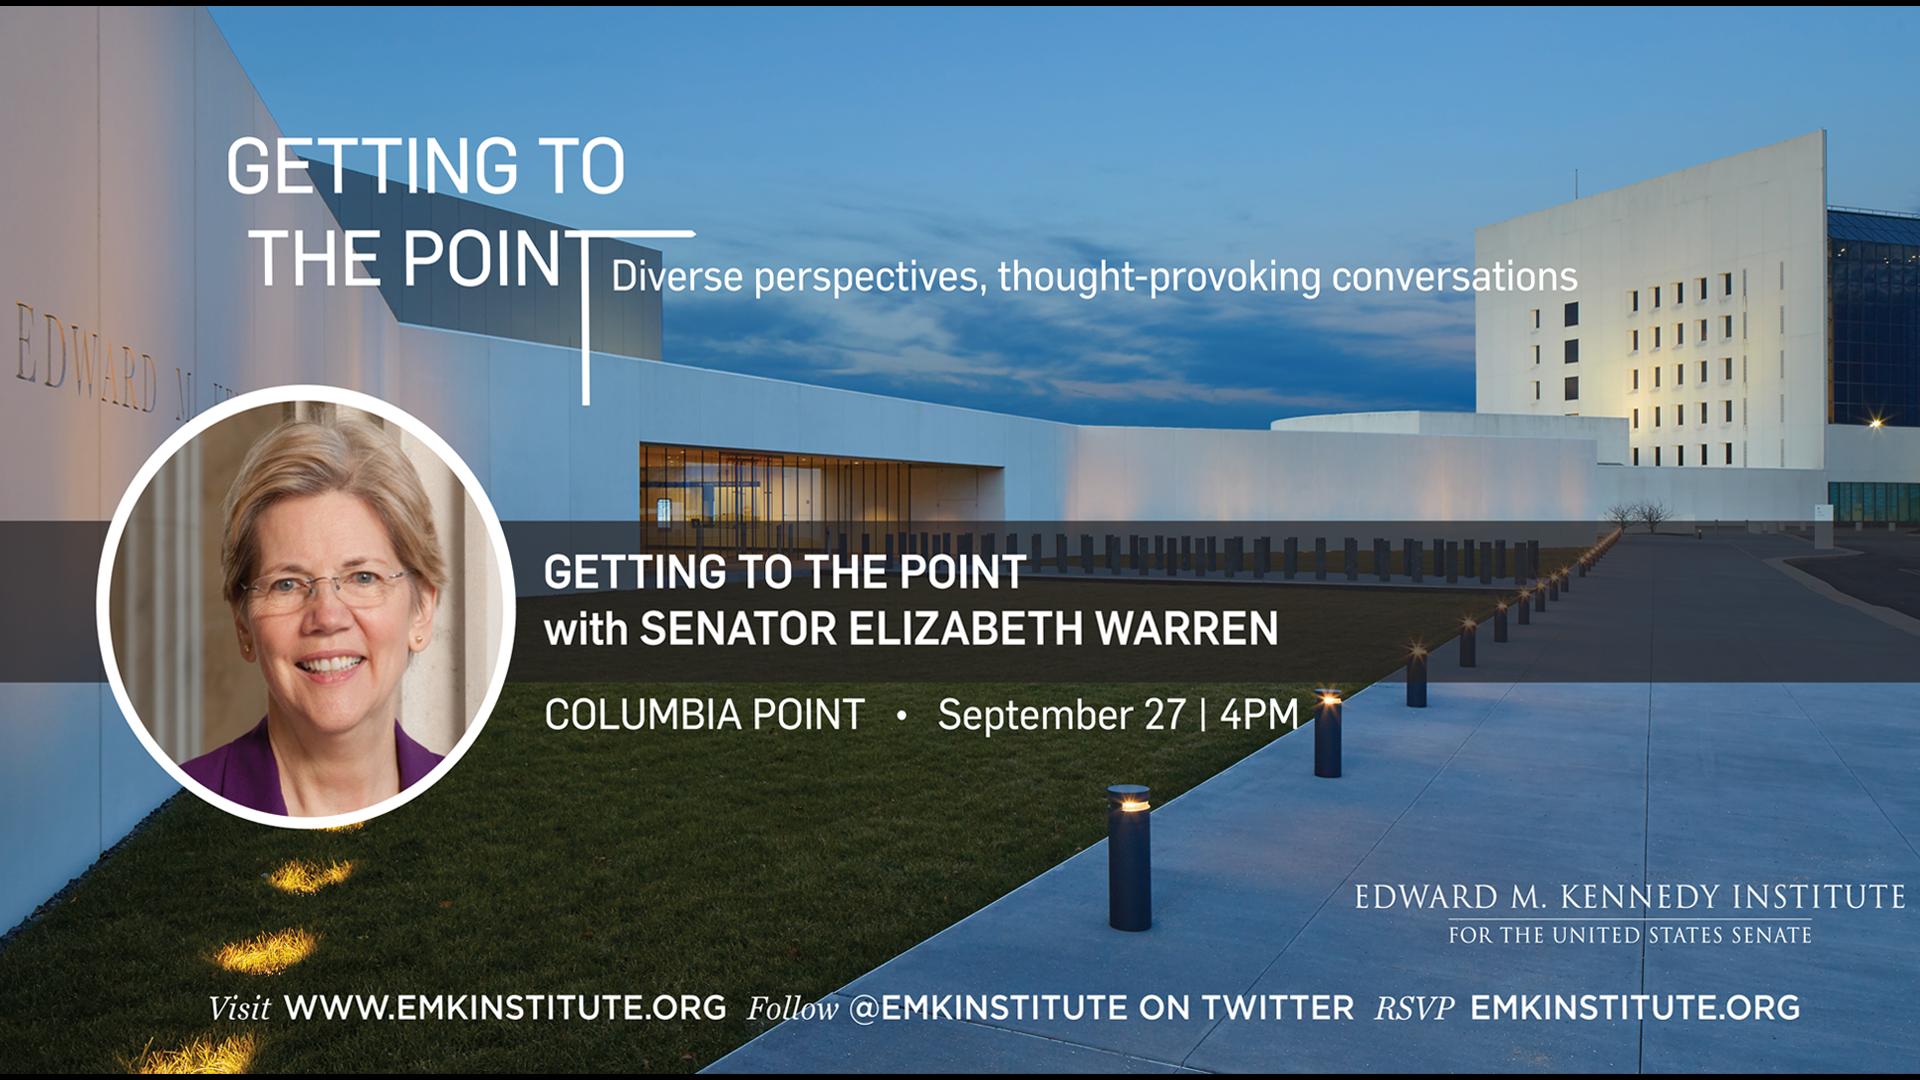 Getting to the Point with Senator Elizabeth Warren